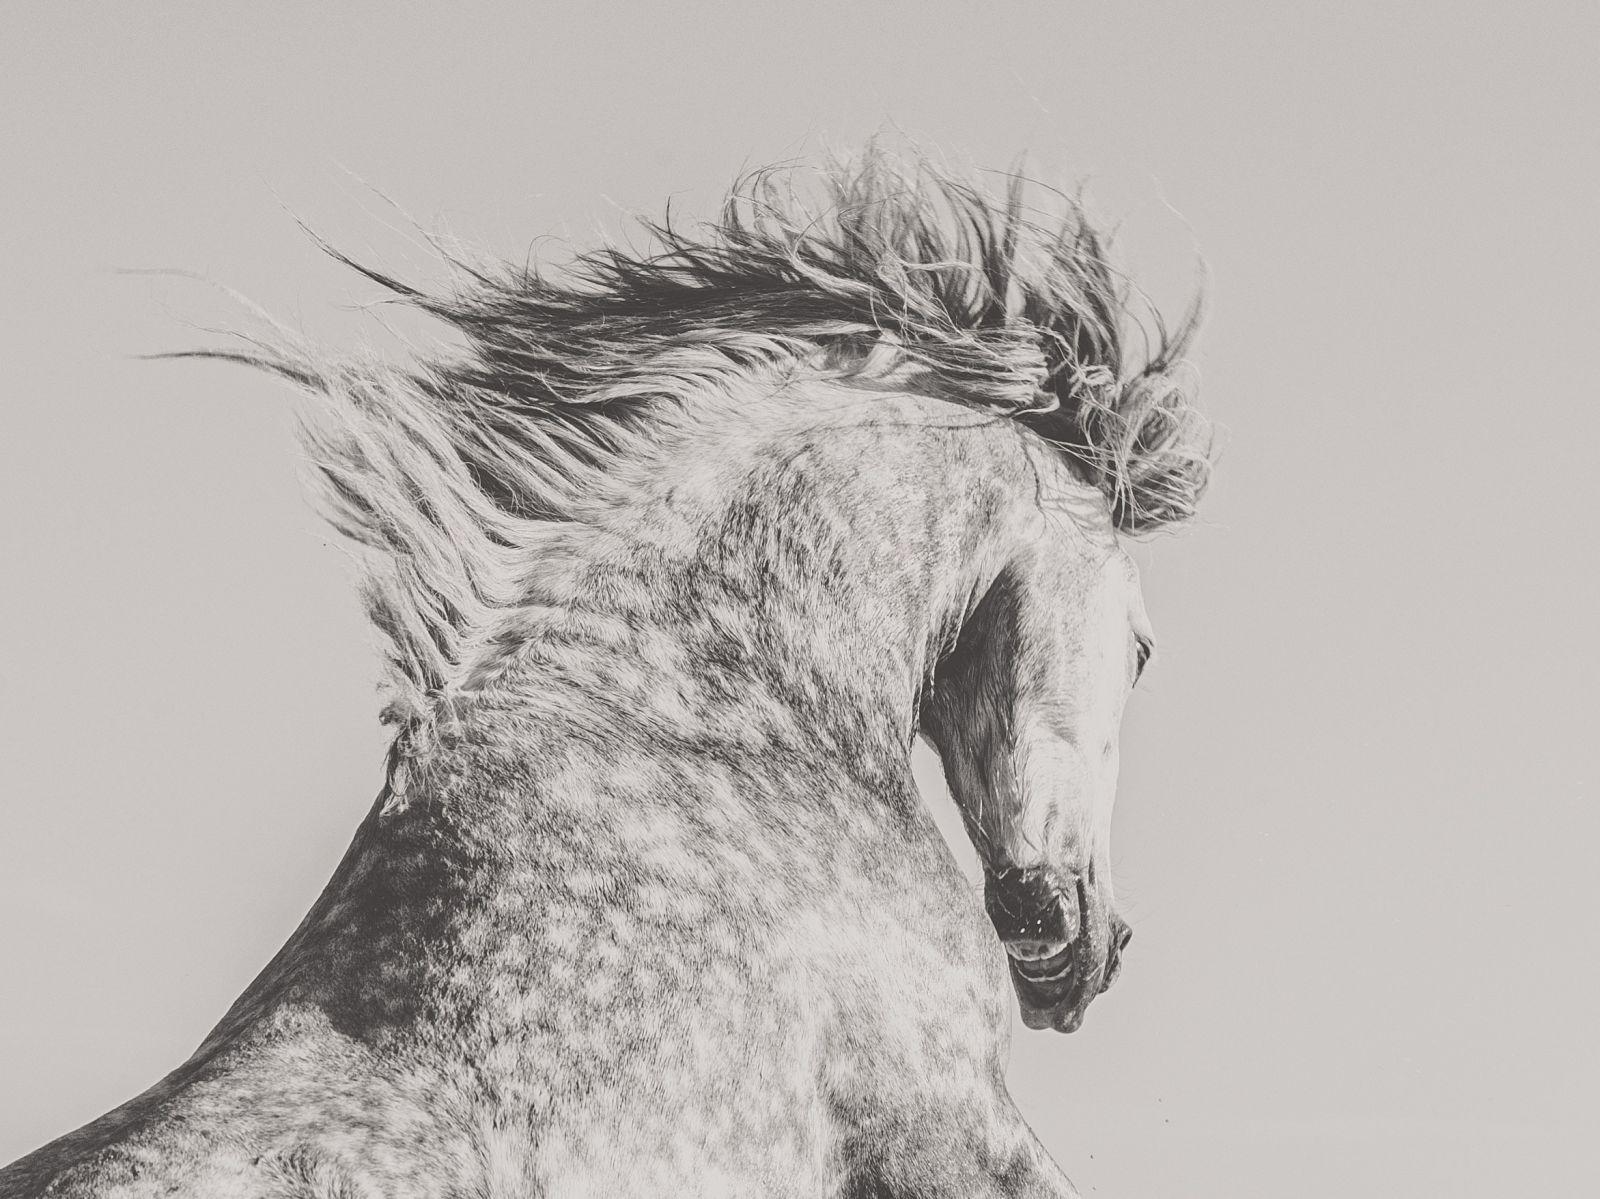 Grey horses rearing with waving mane